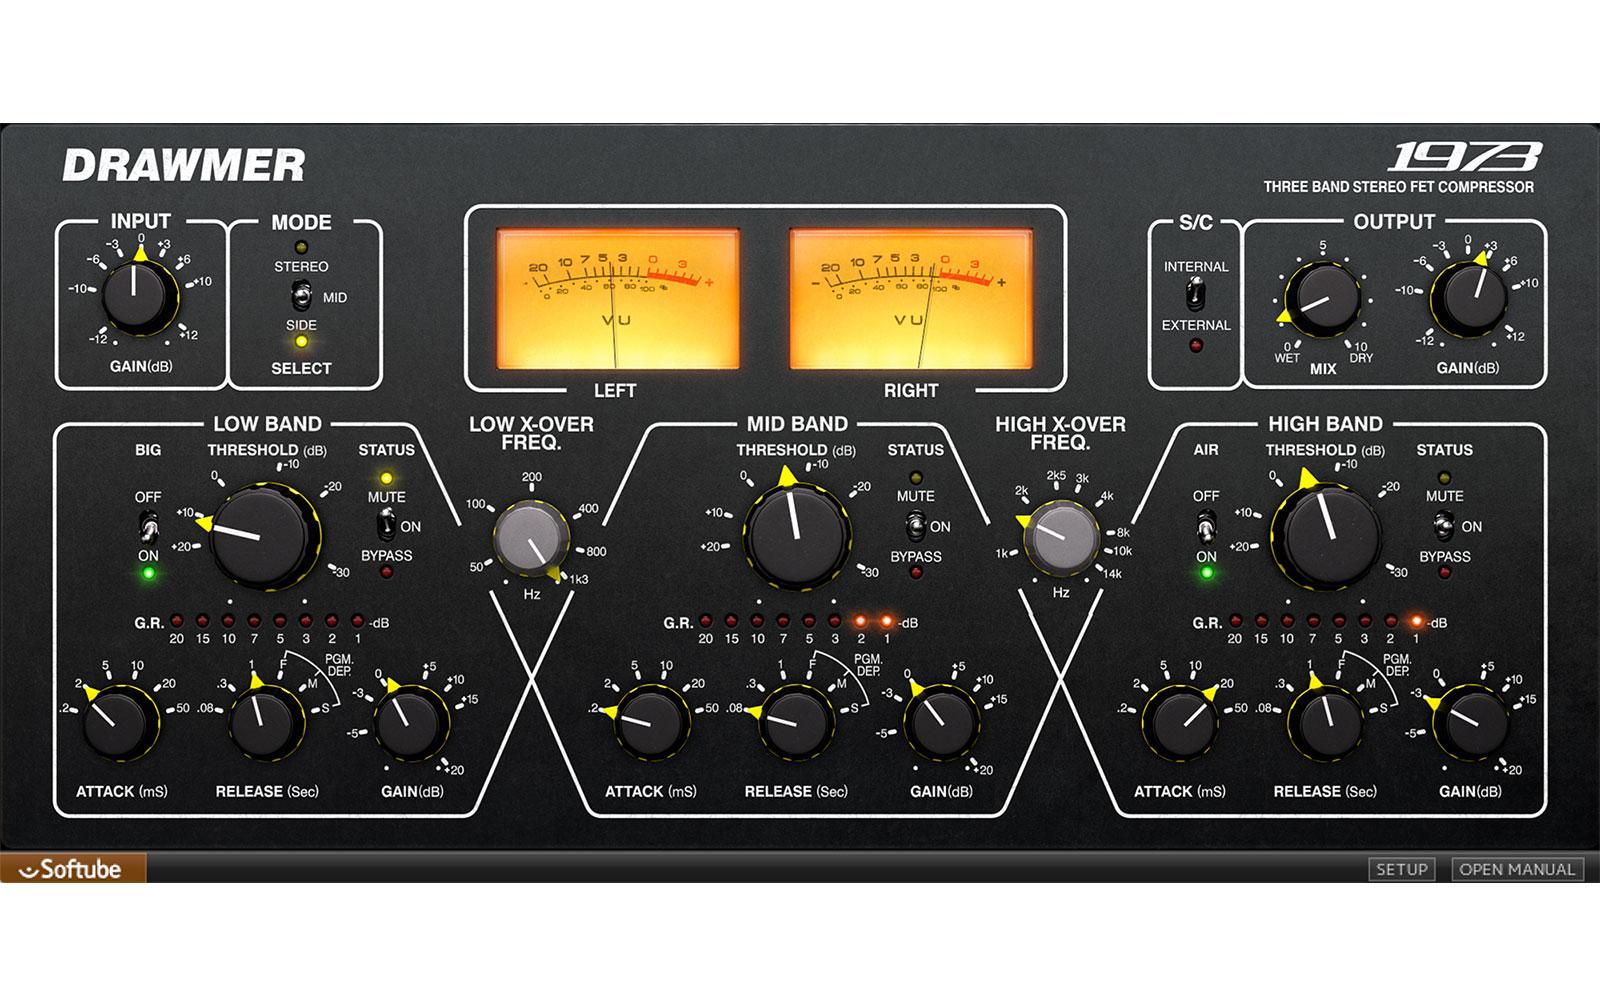 softube-drawmer-1973-multiband-kompressor-esd-download-